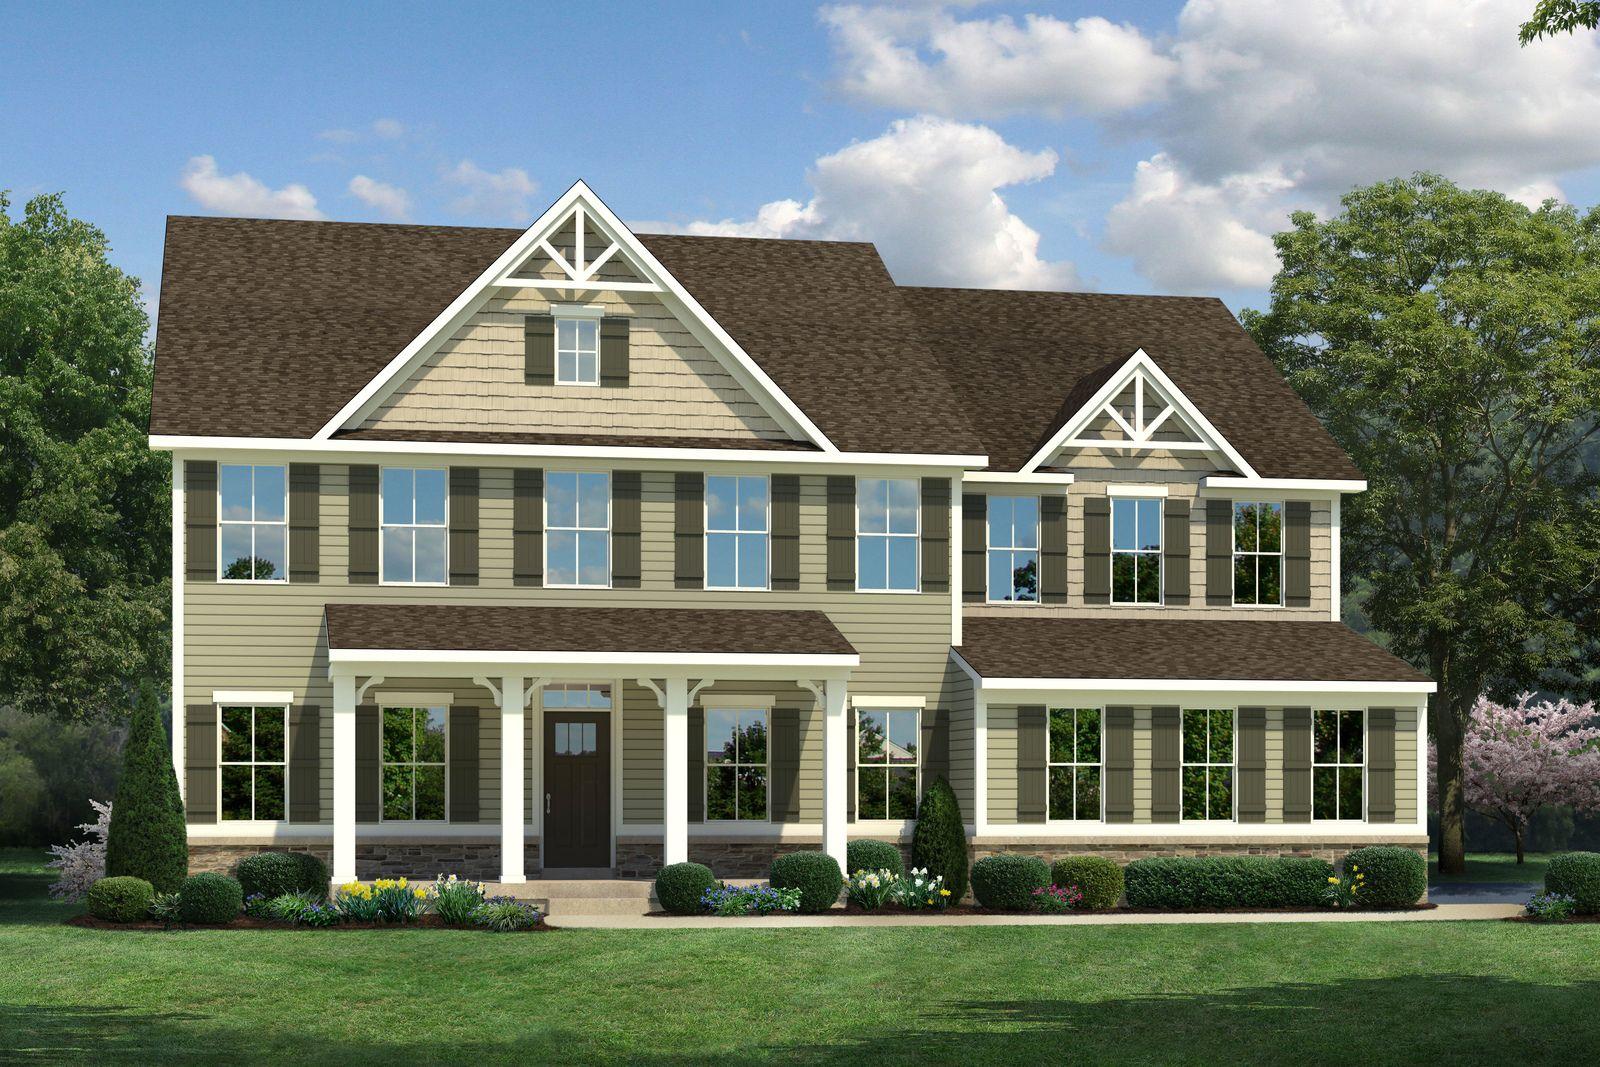 Tbd North Waggoneer, Blacklick, OH Homes & Land - Real Estate